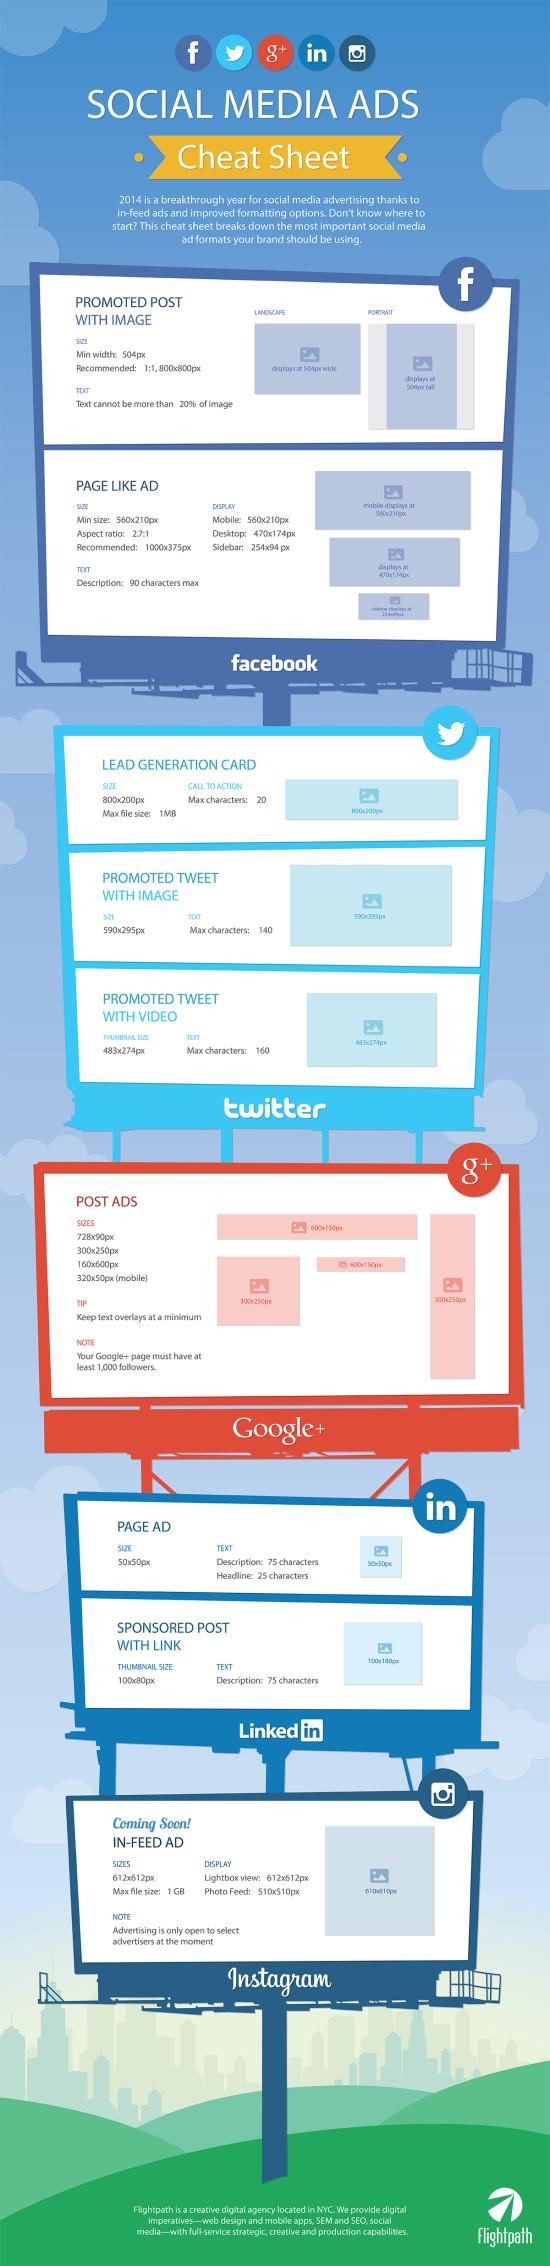 FLI_Infographic_Social-ads-cheat-sheet_v2.1